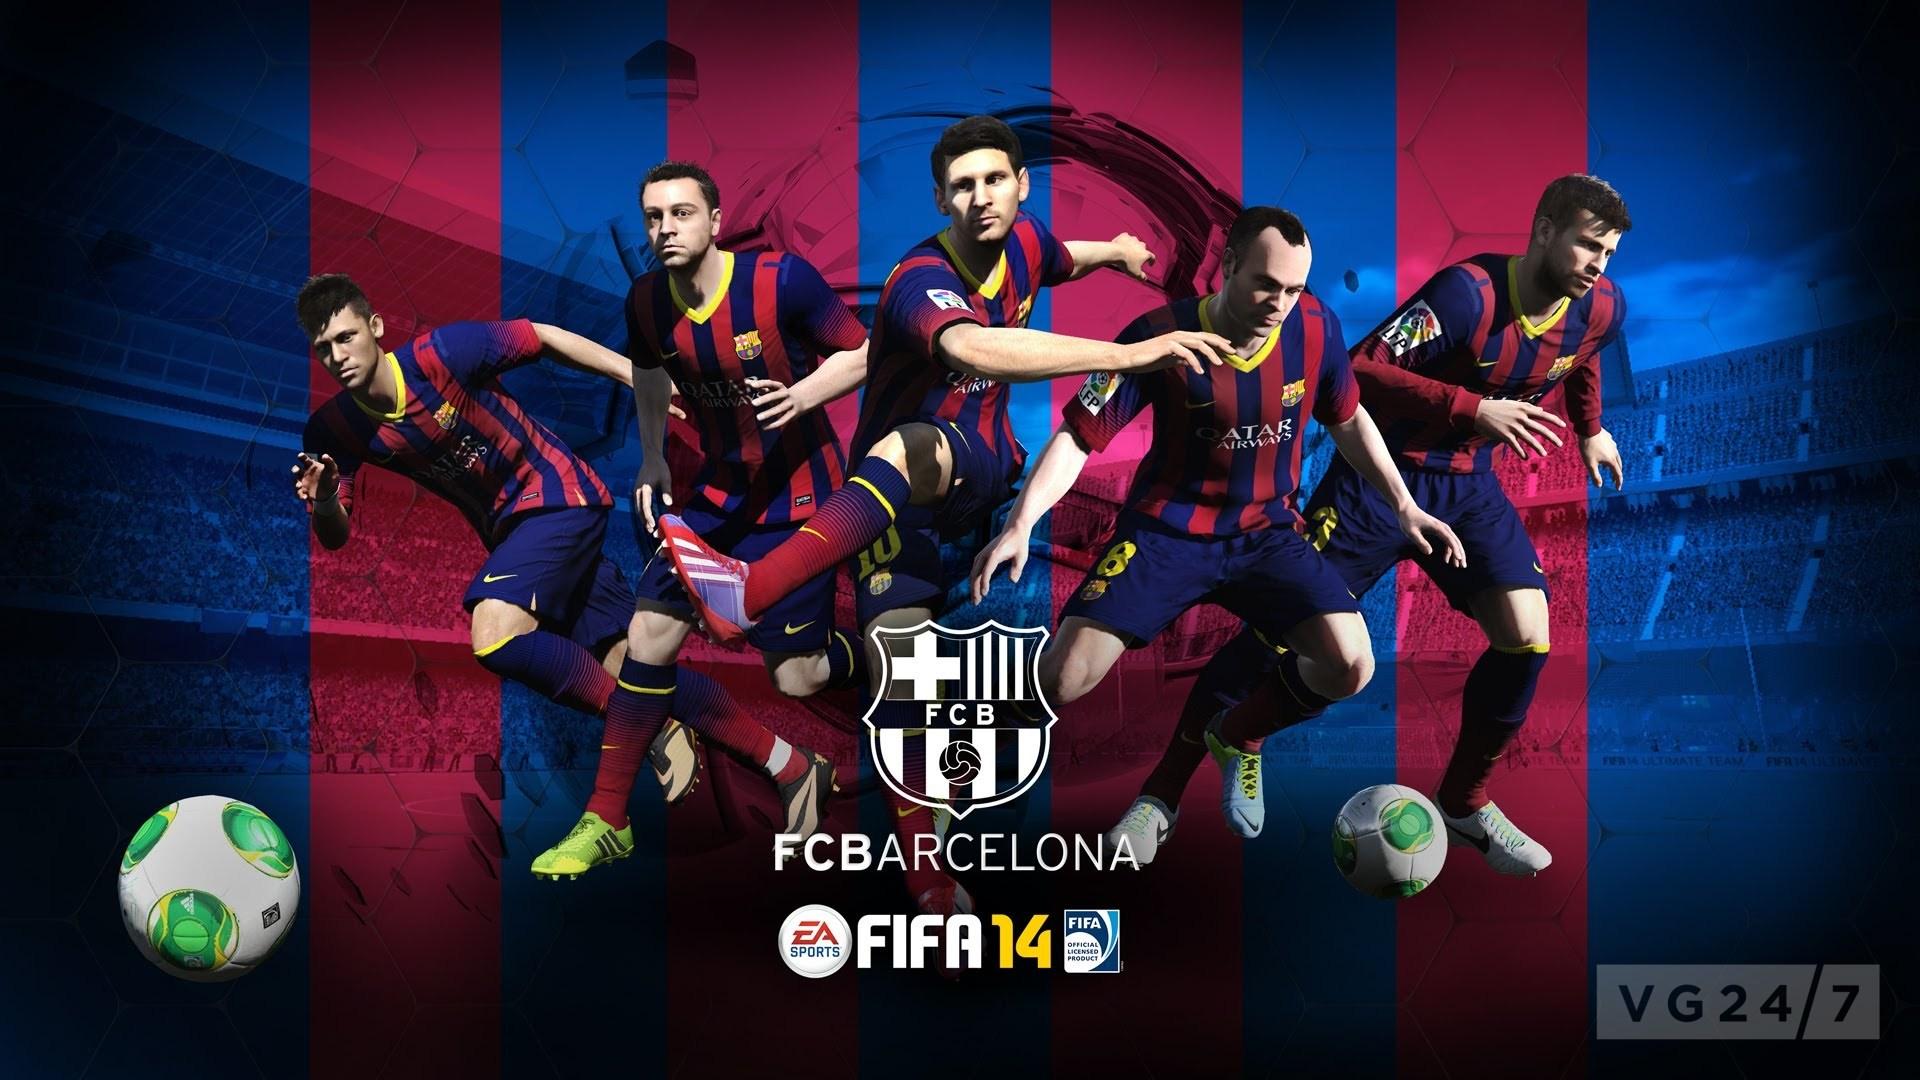 Turnierformat Des Fut Champions Cups In Barcelona Fifa 18 Global